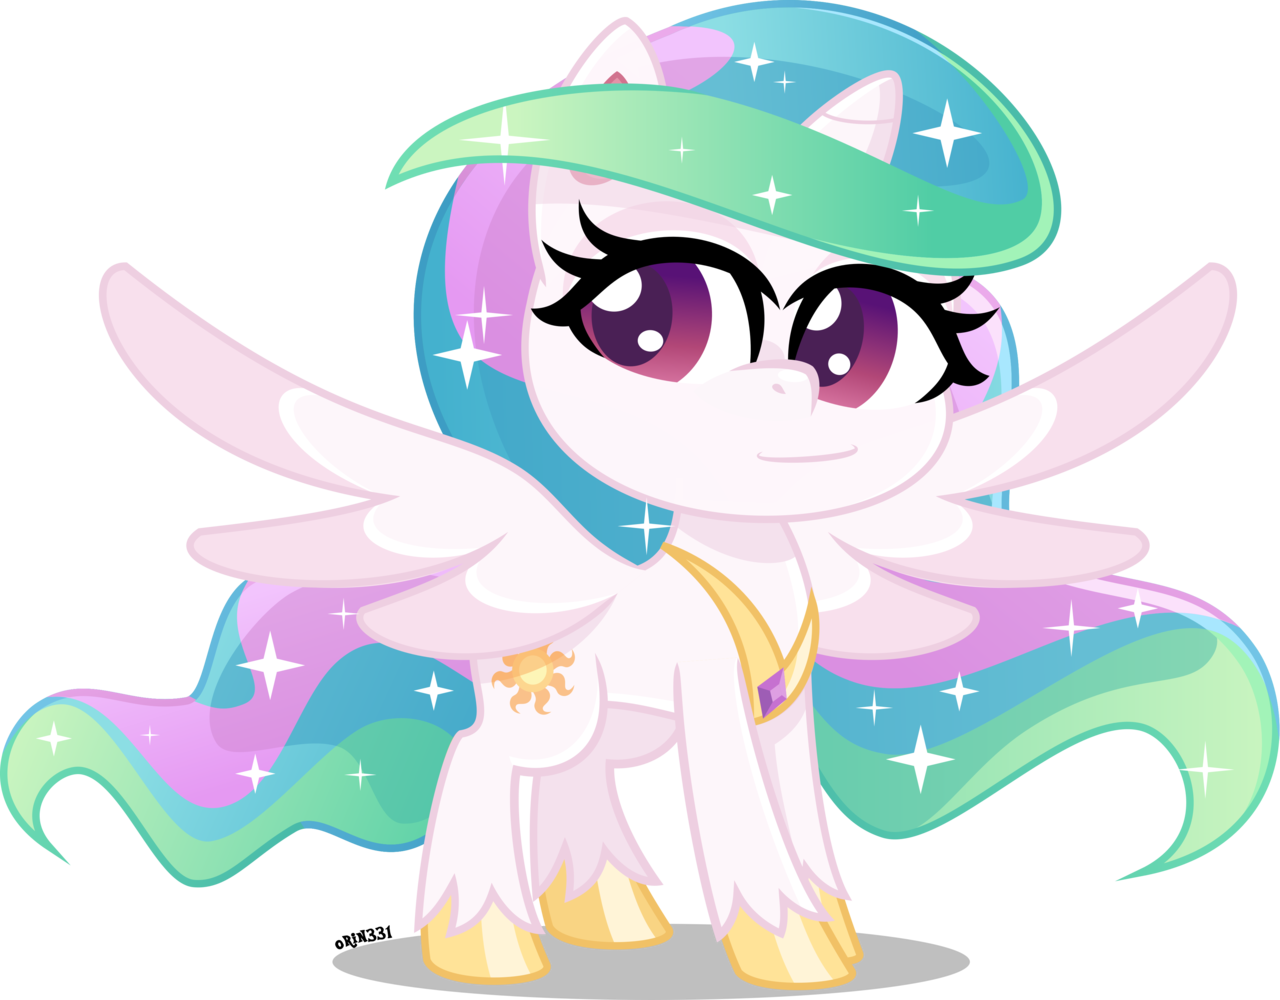 https://derpibooru.org/2208099?q=my+little+pony%3A+pony+life